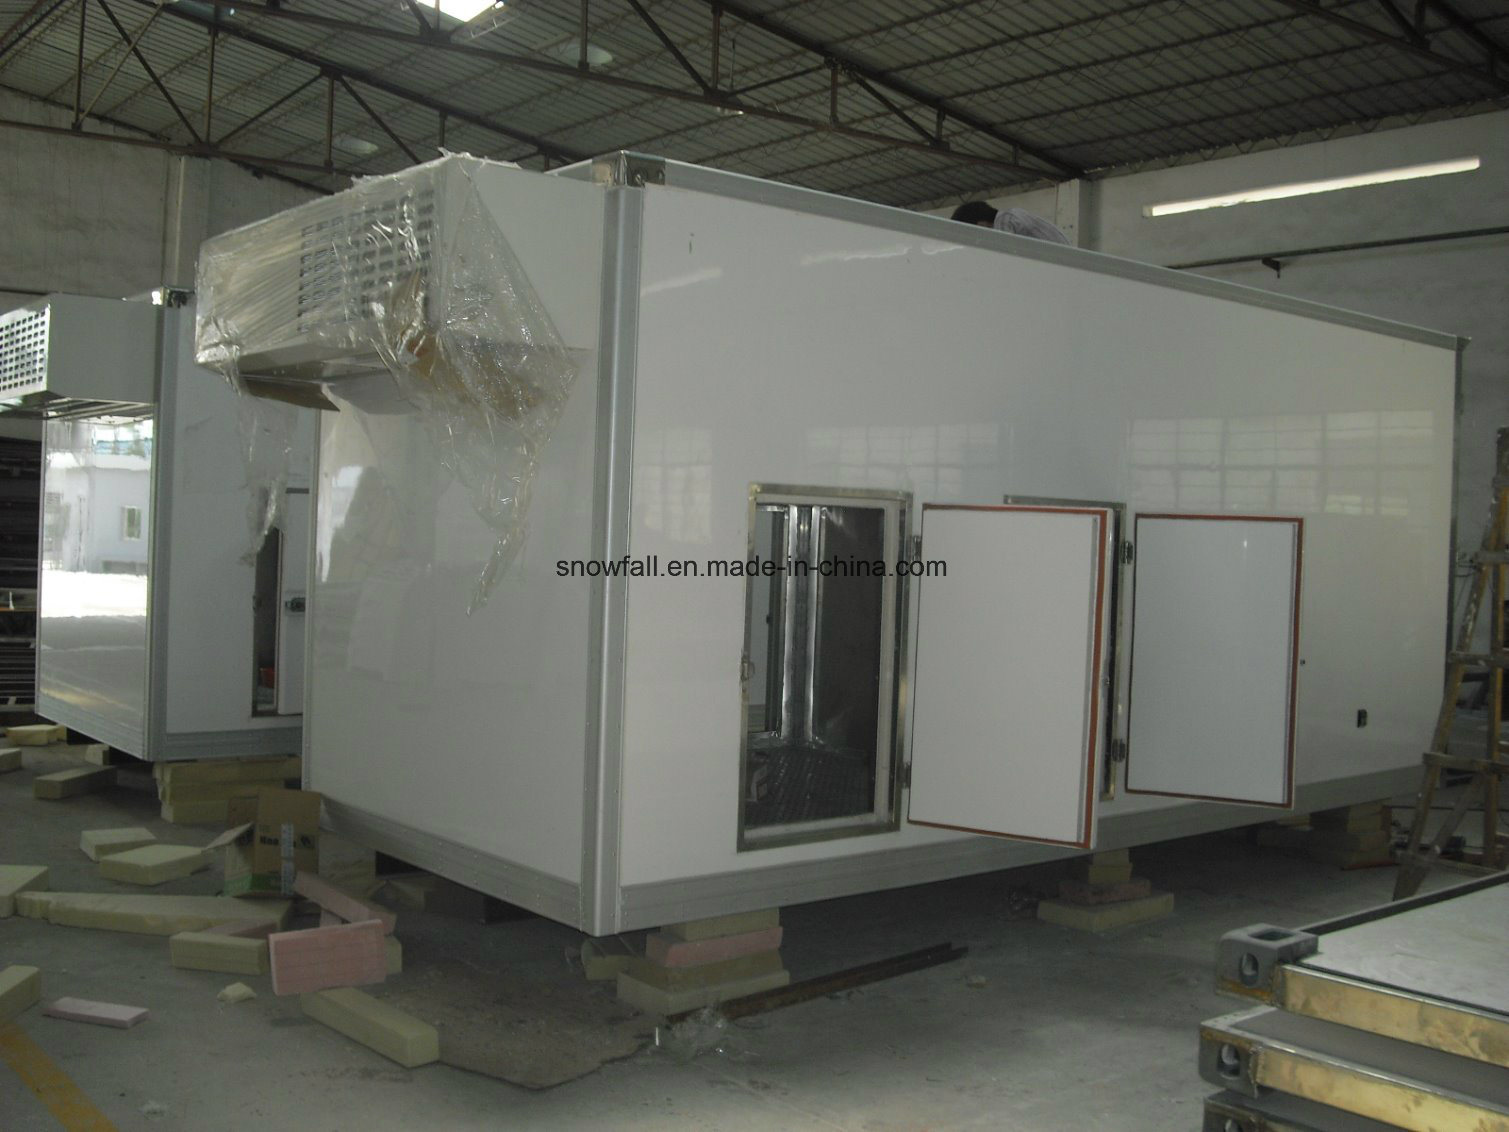 Eutectic Plate Ice Cream Truck Body